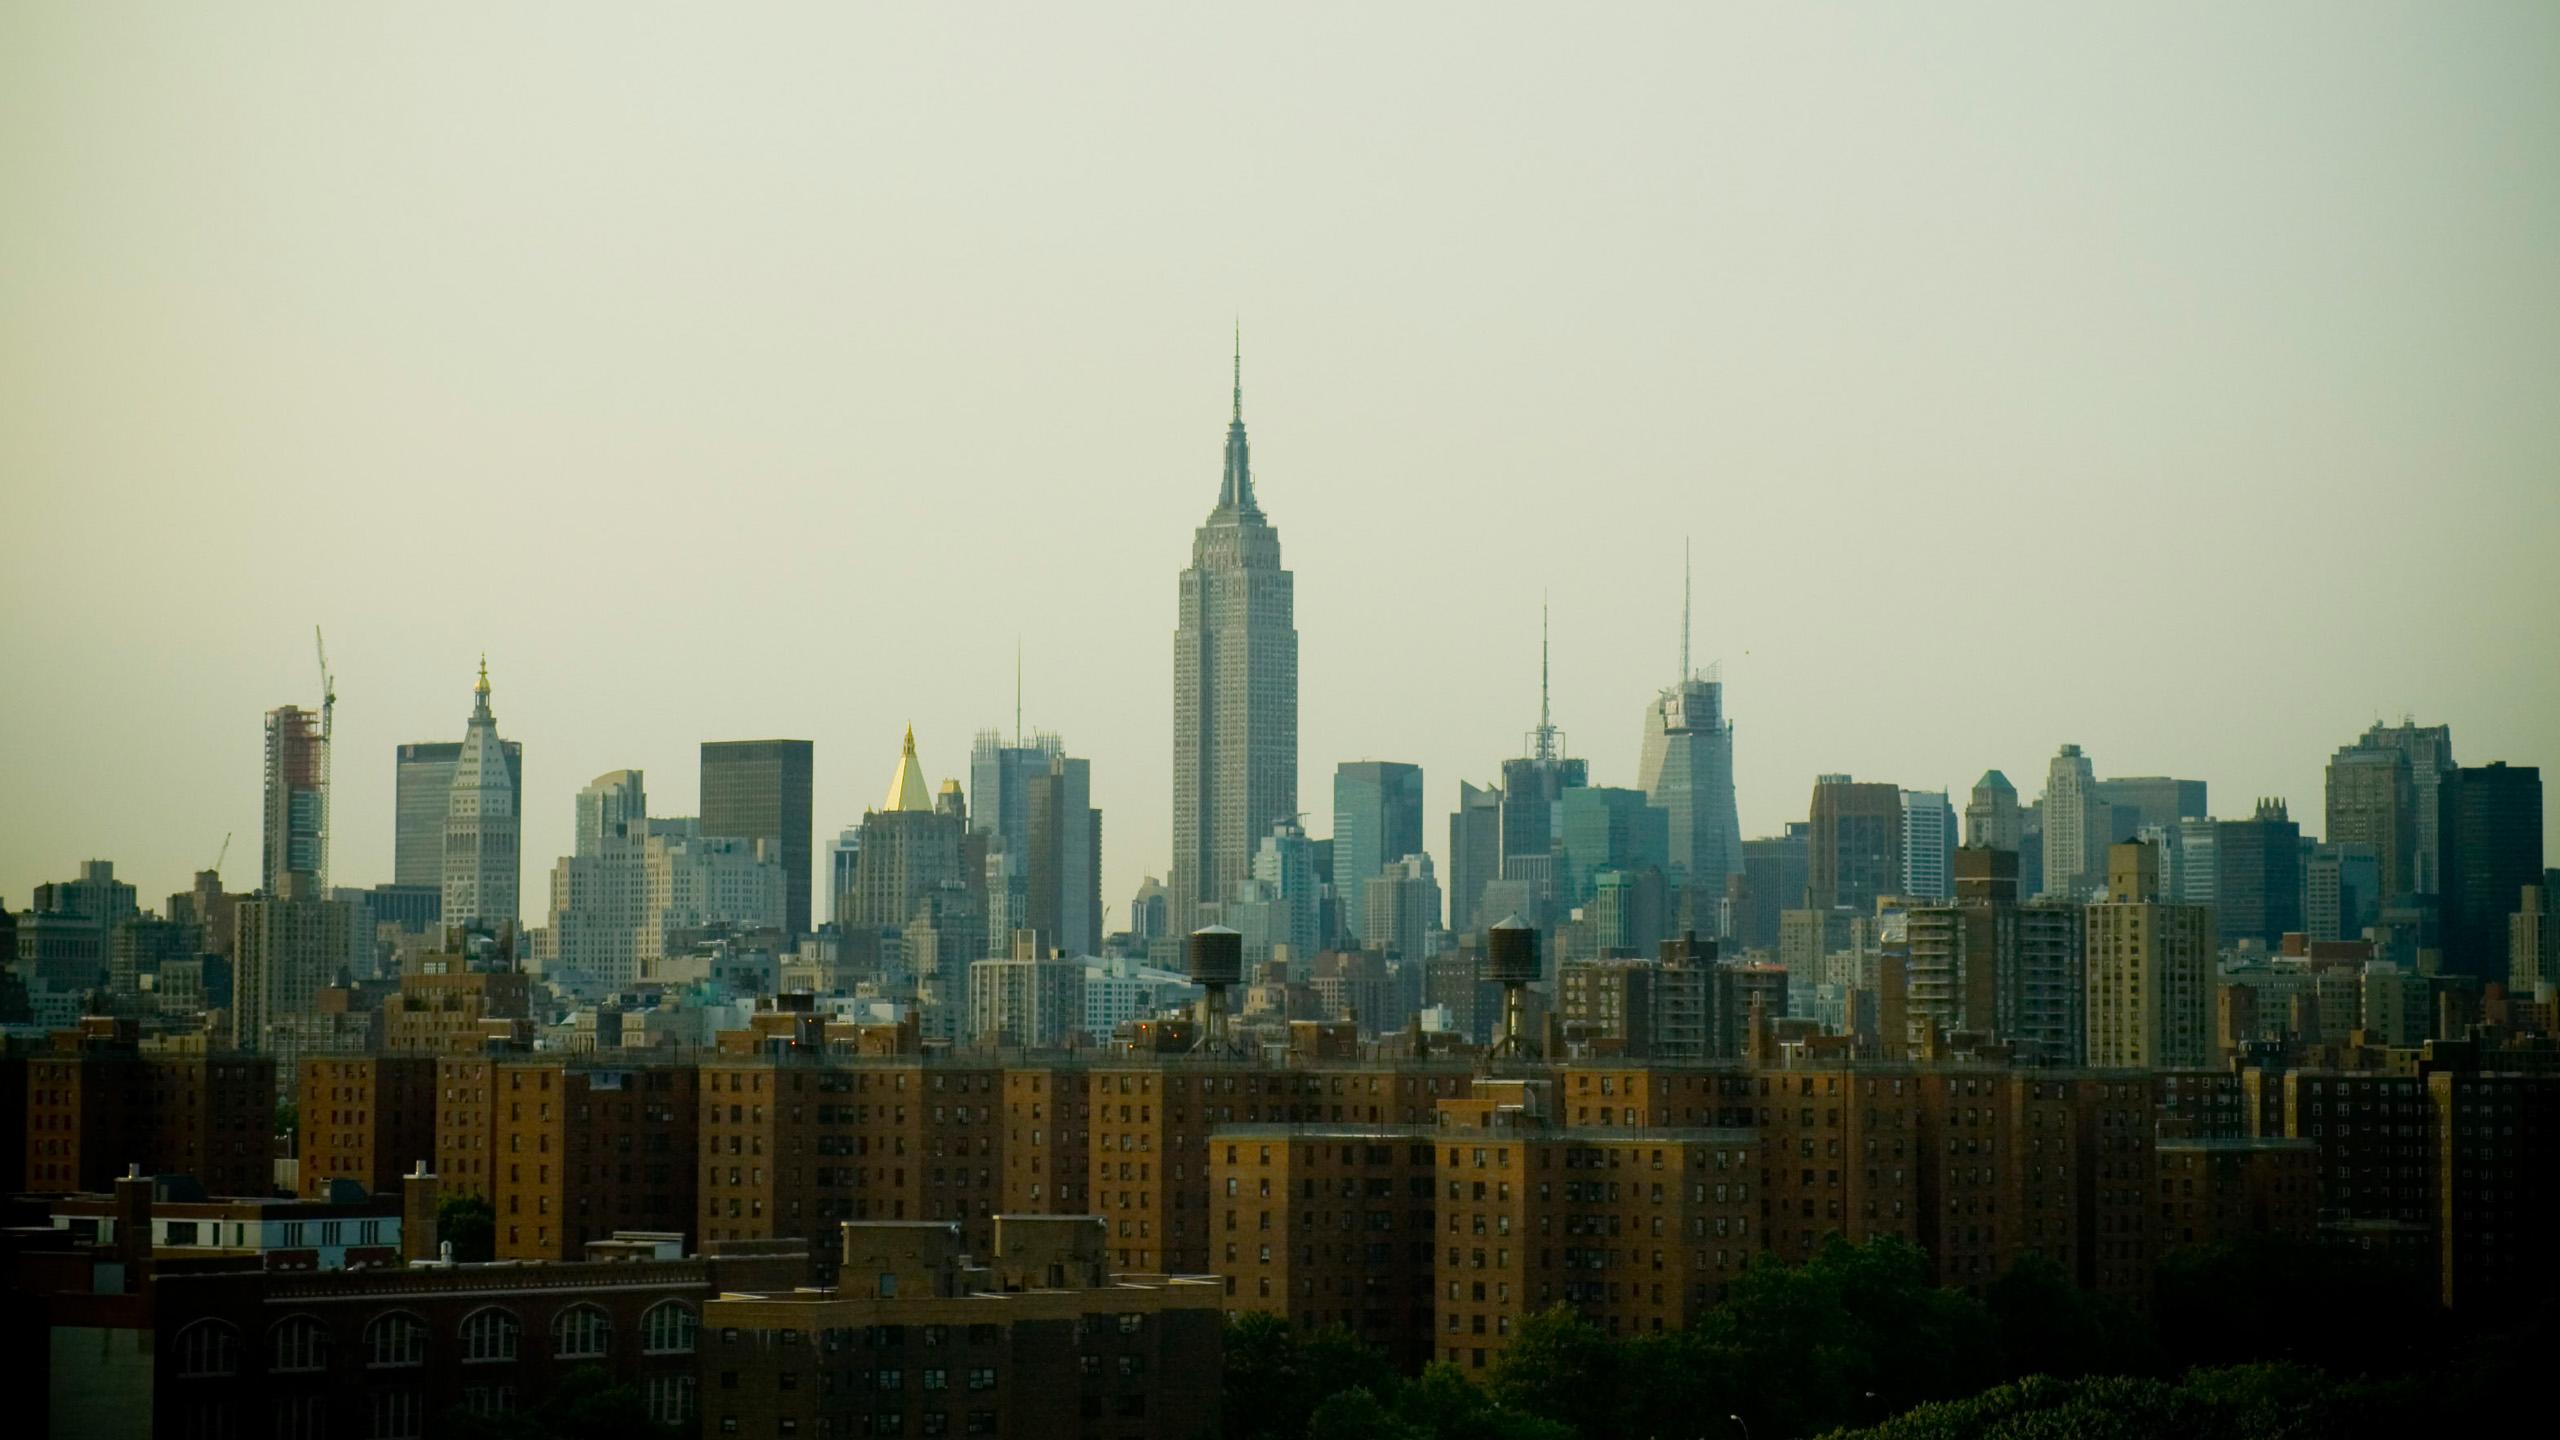 New York City Full Hd Wallpaper 18 Hd Empire State Building Wallpapers Hdwallsource Com